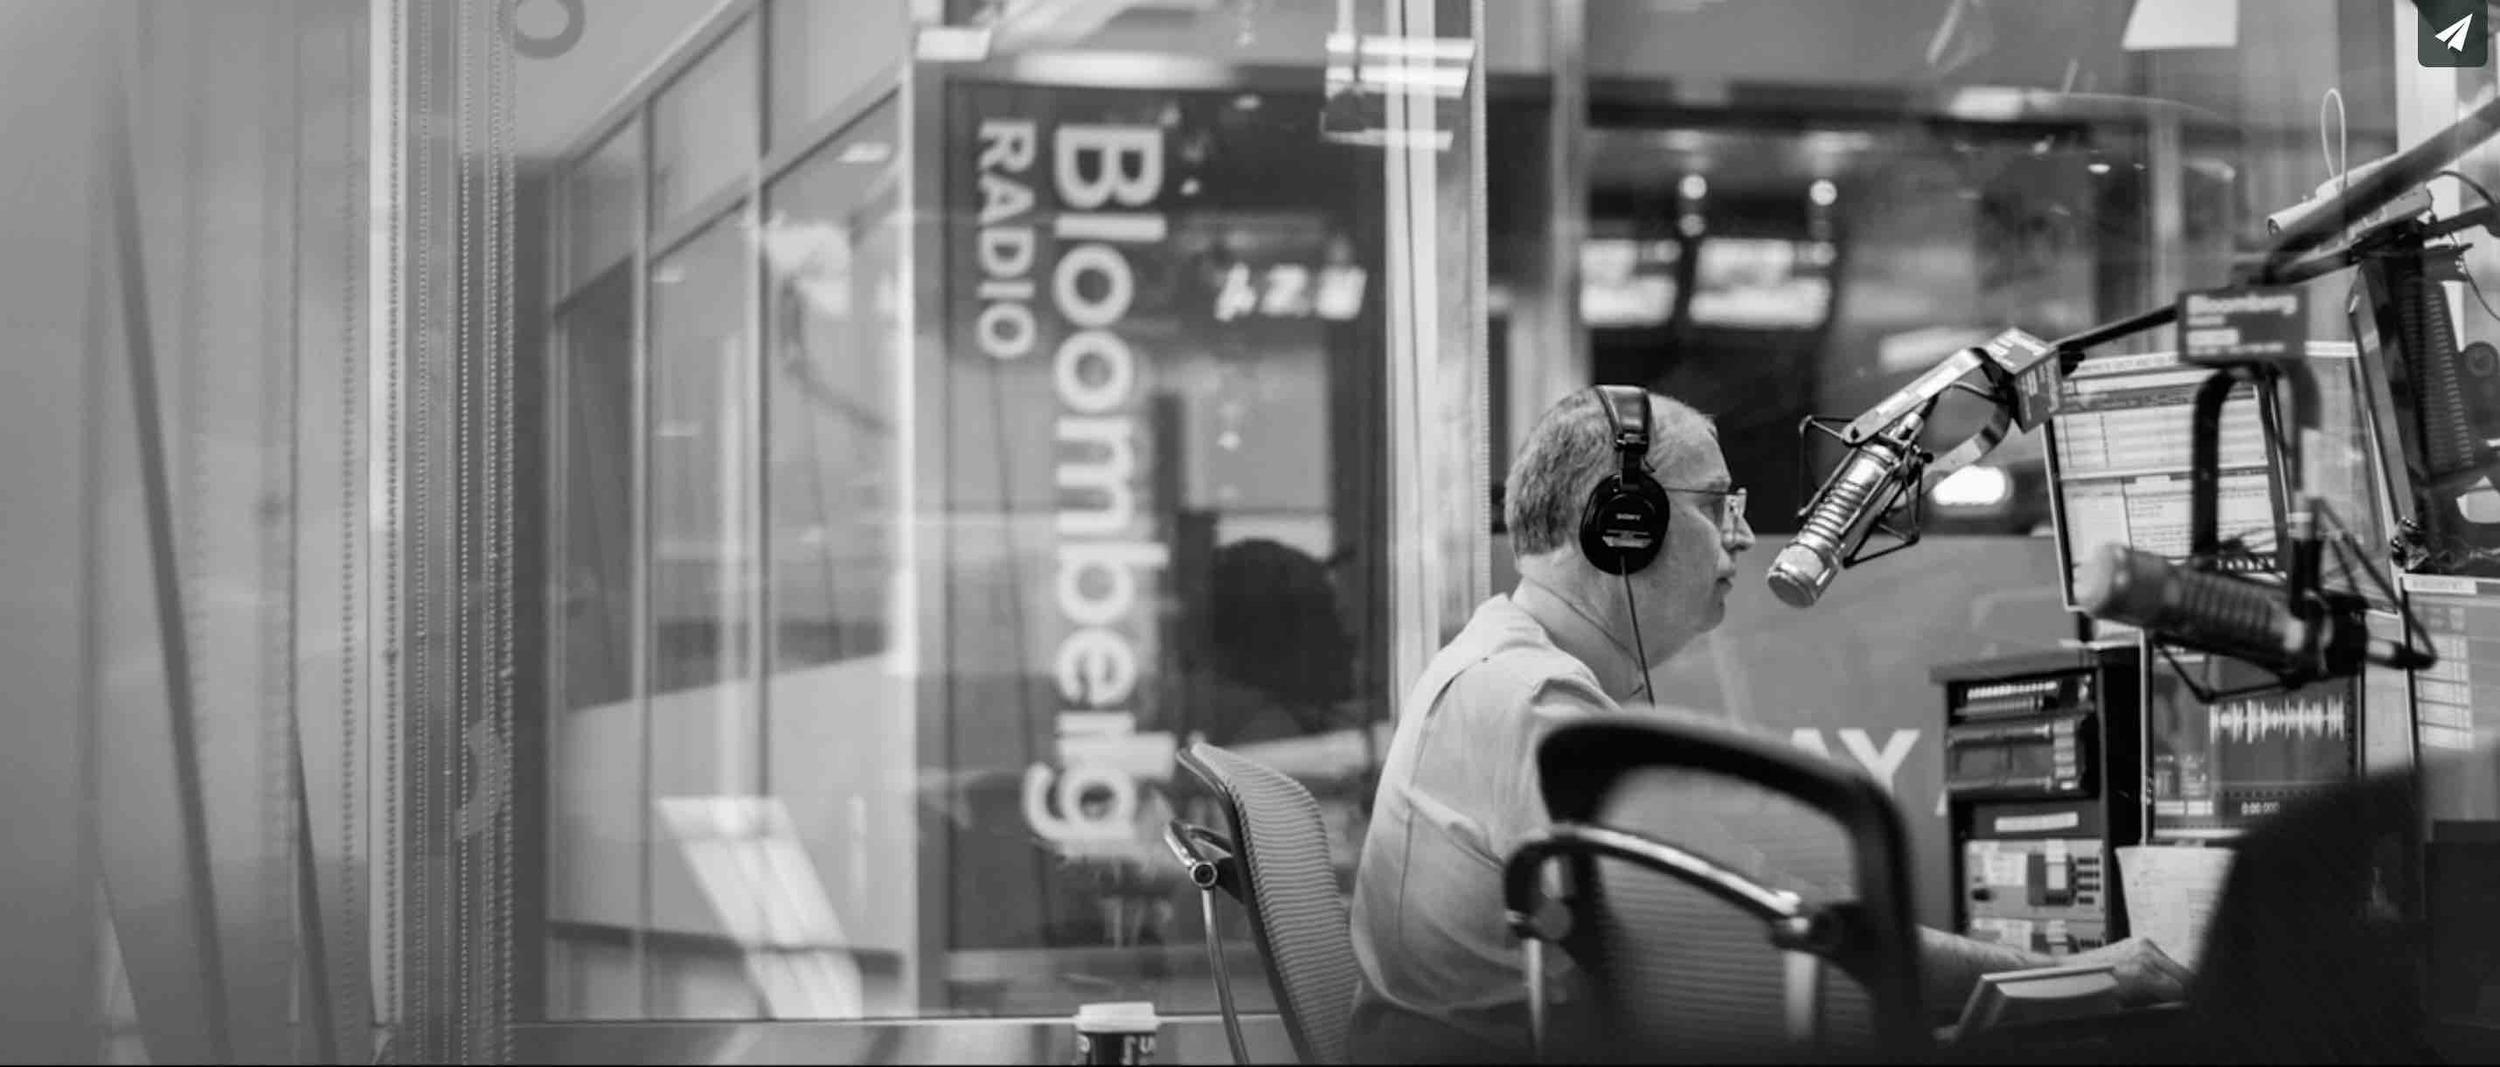 Charlie working at the Bloomberg Radio, New York City